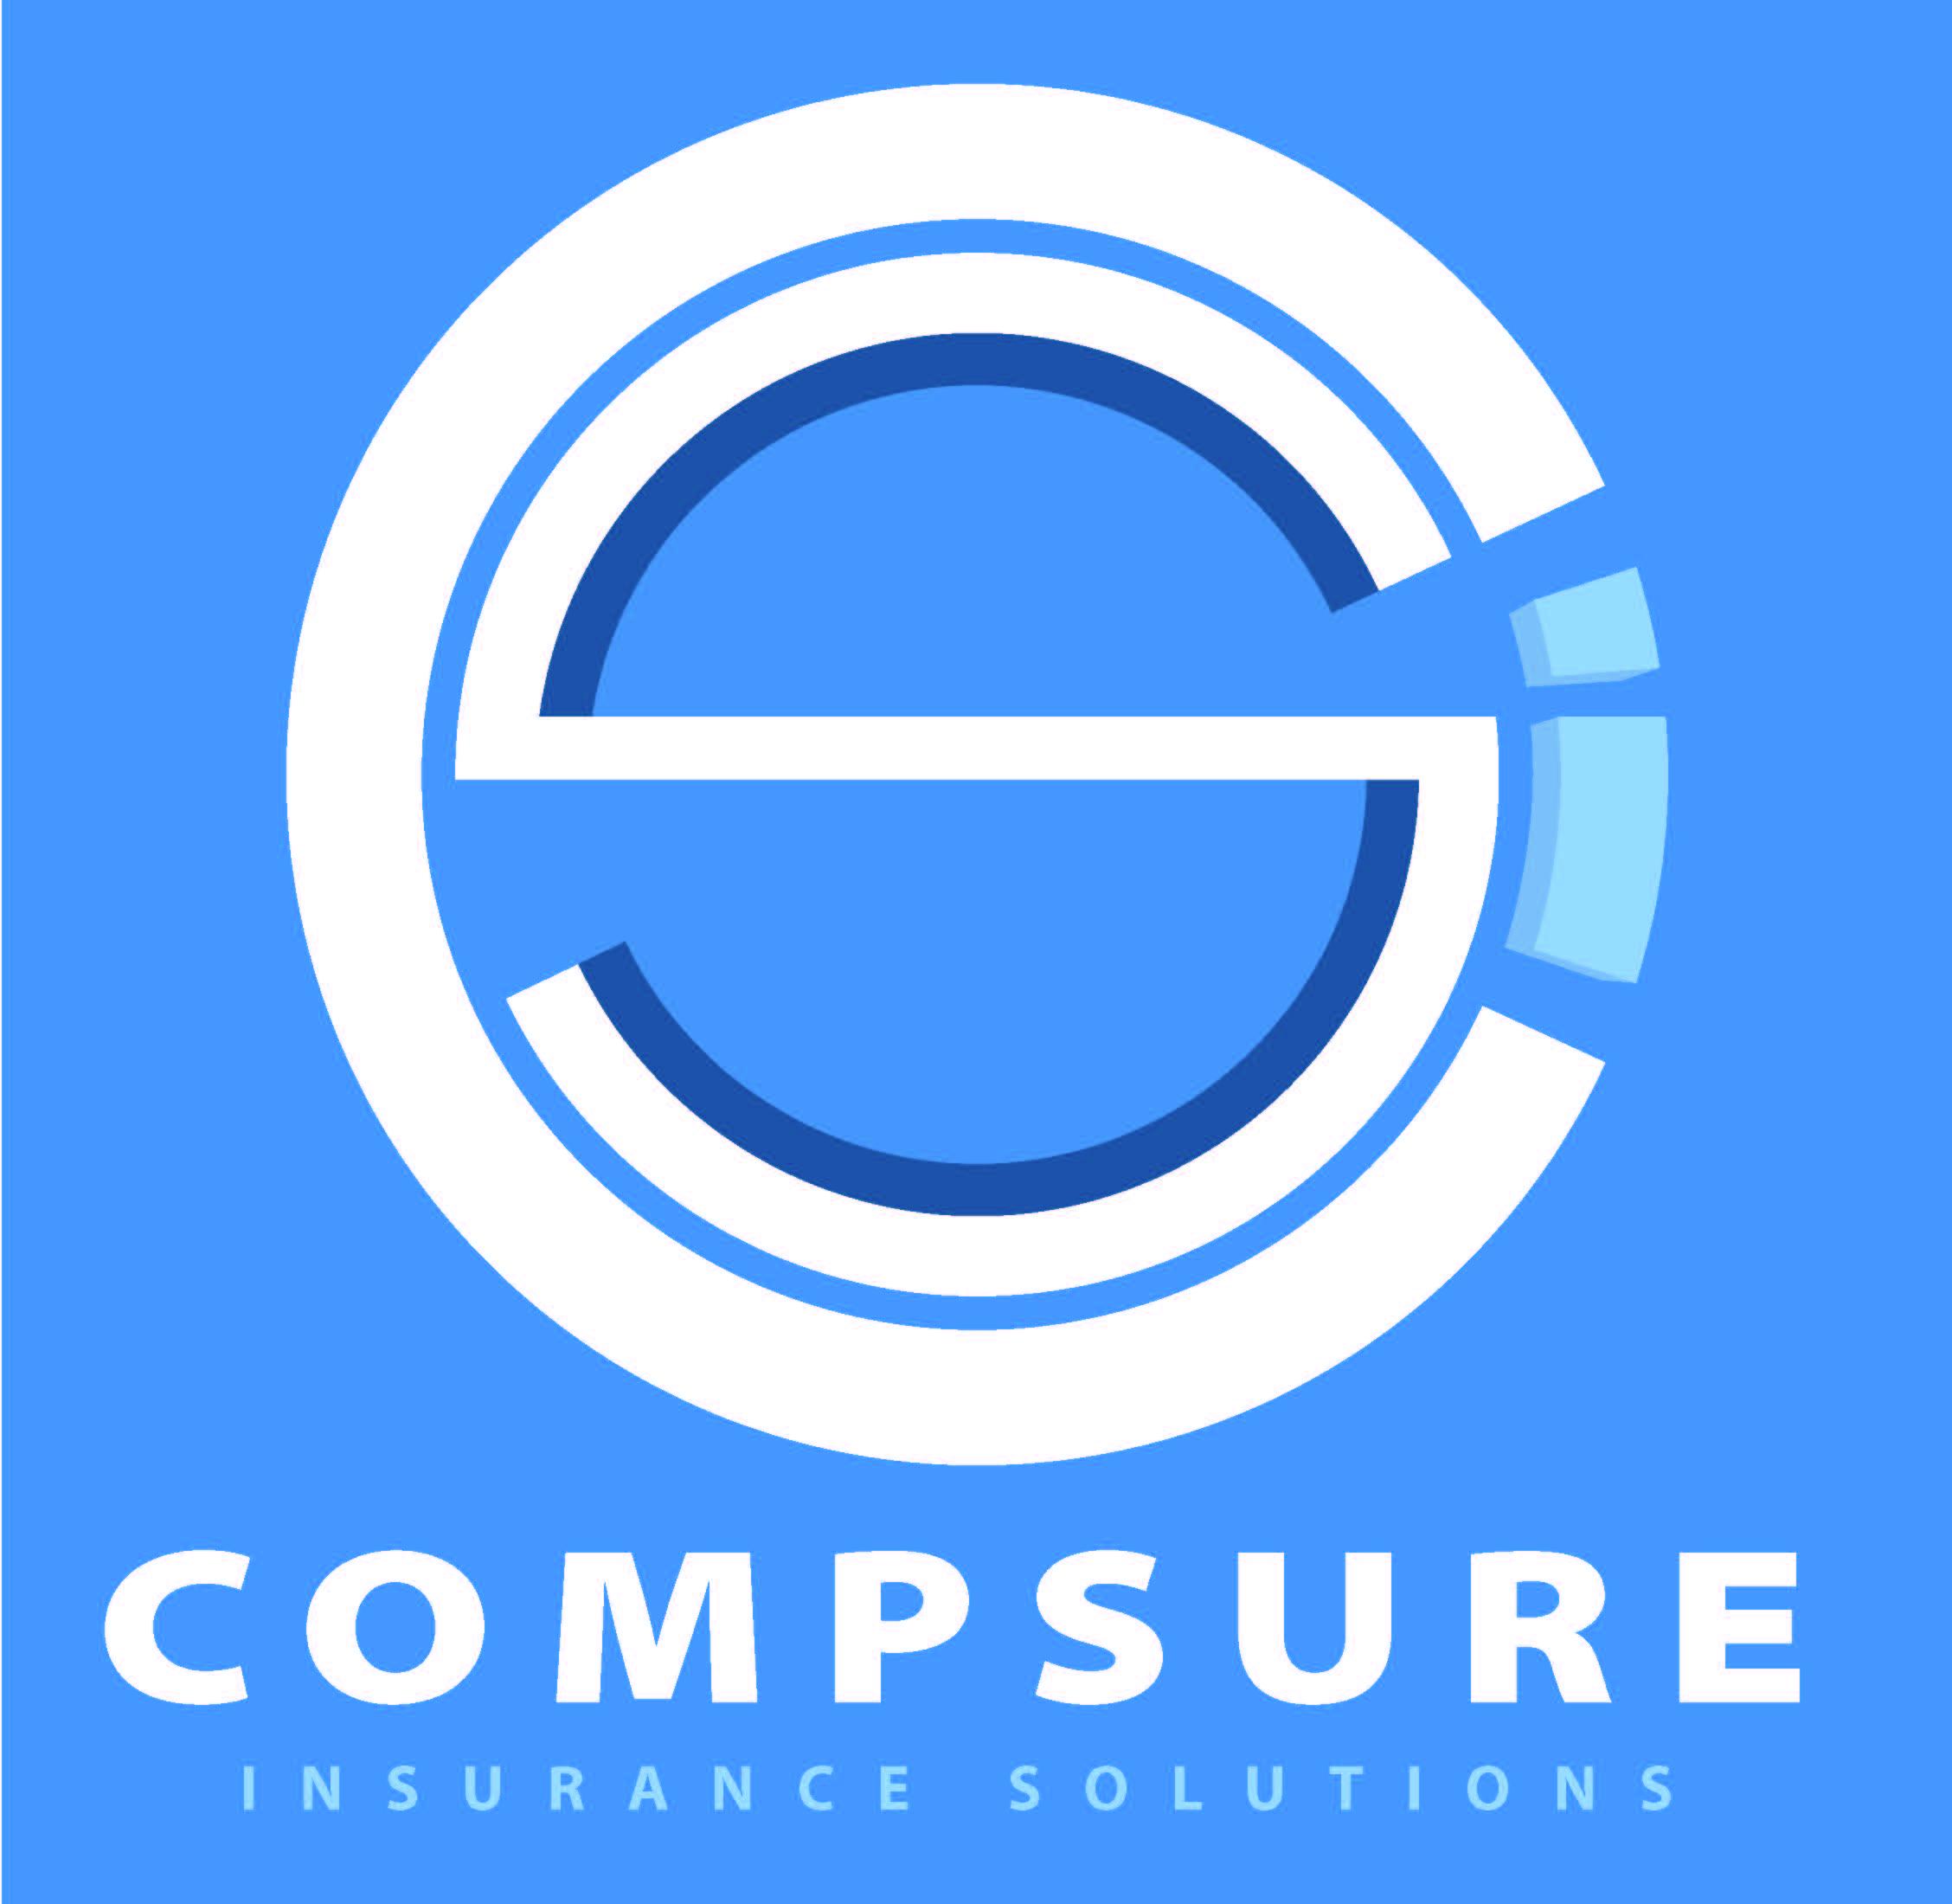 Compsure Insurance Solutions